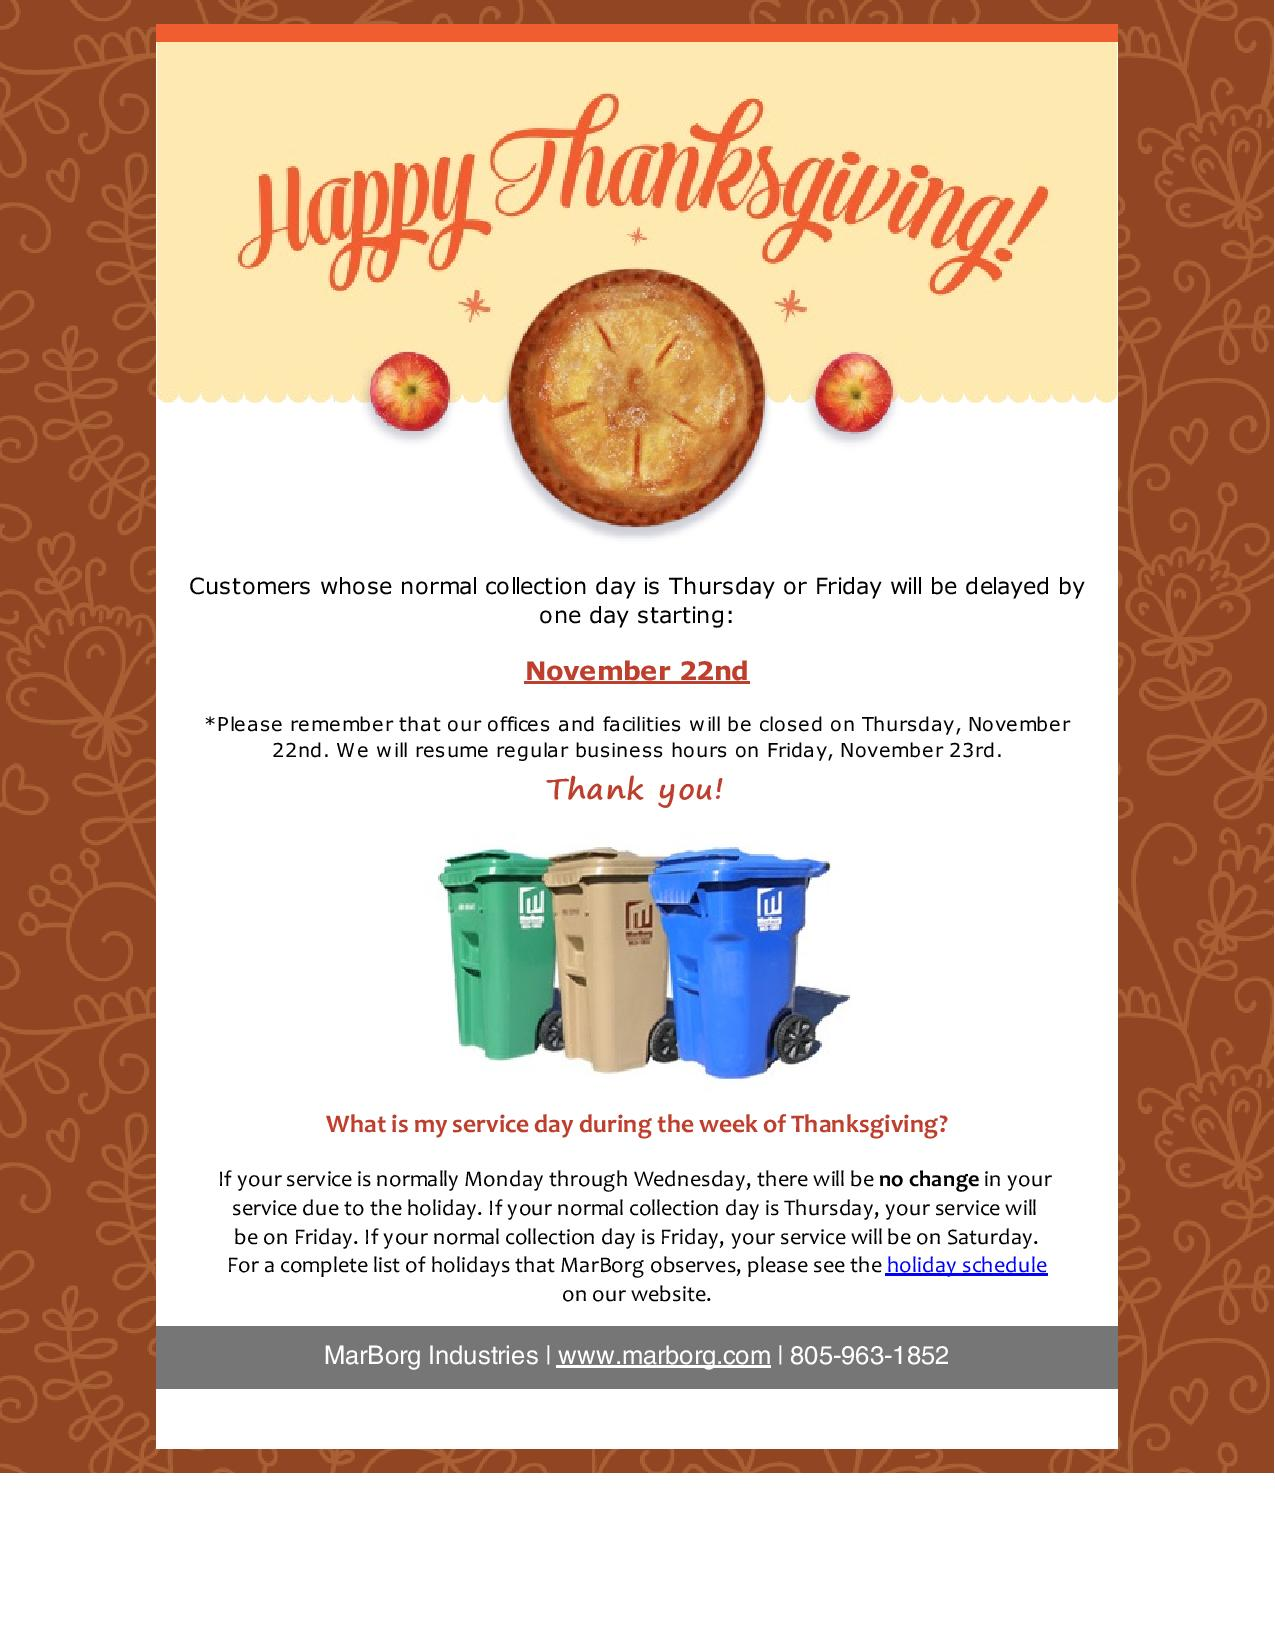 Thanksgiving Service Delays